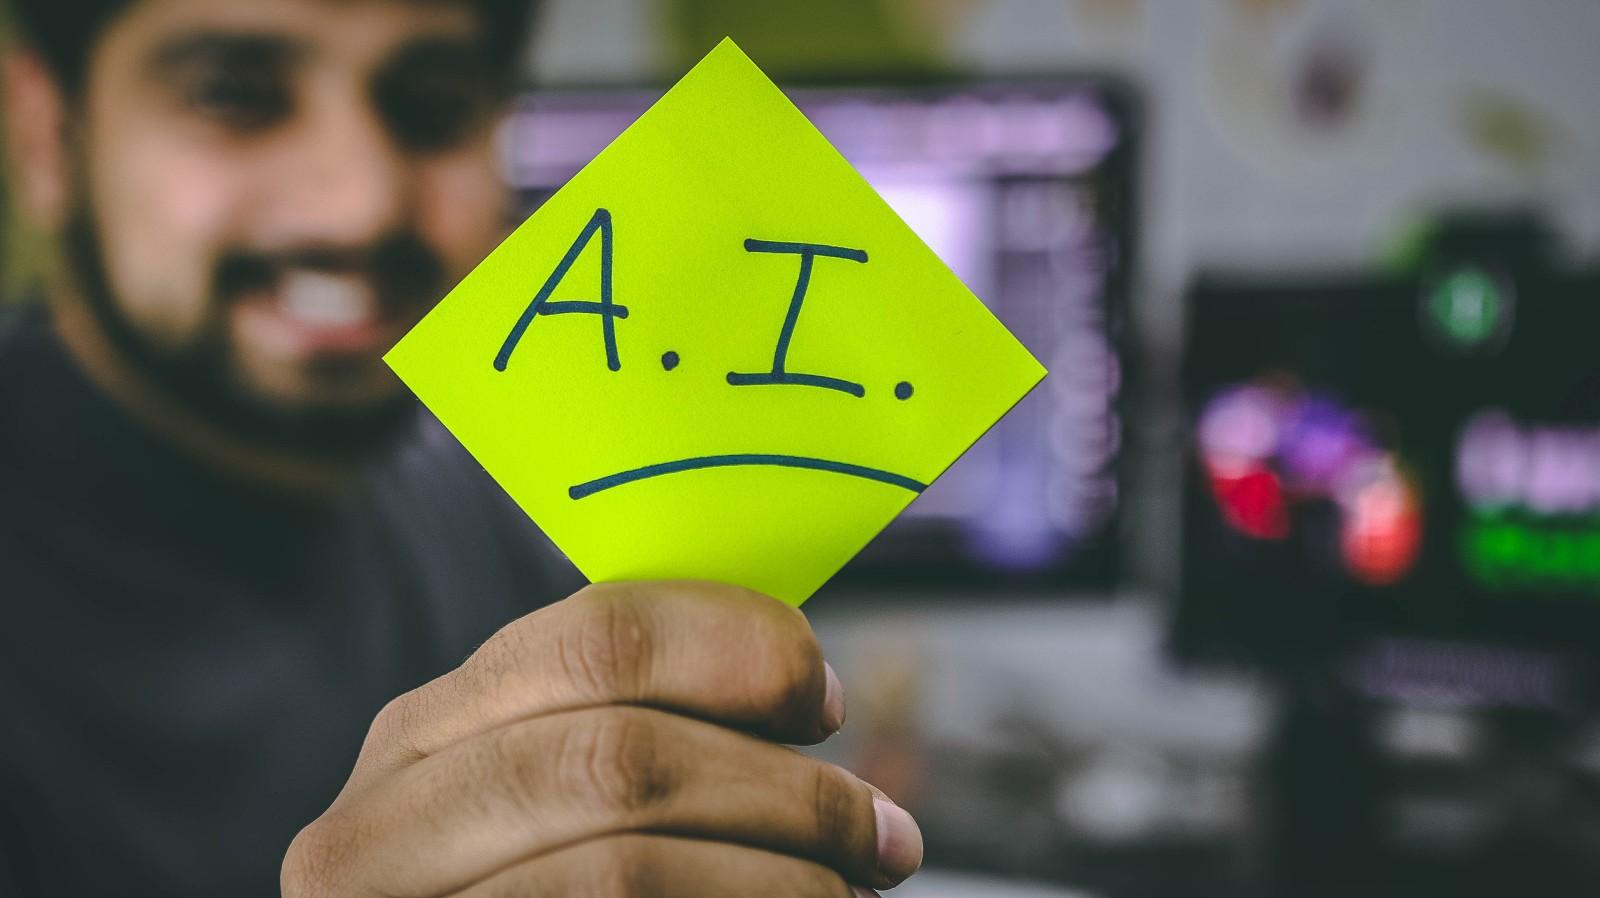 Tel Aviv University And Google Launch 'AI For Social Good'